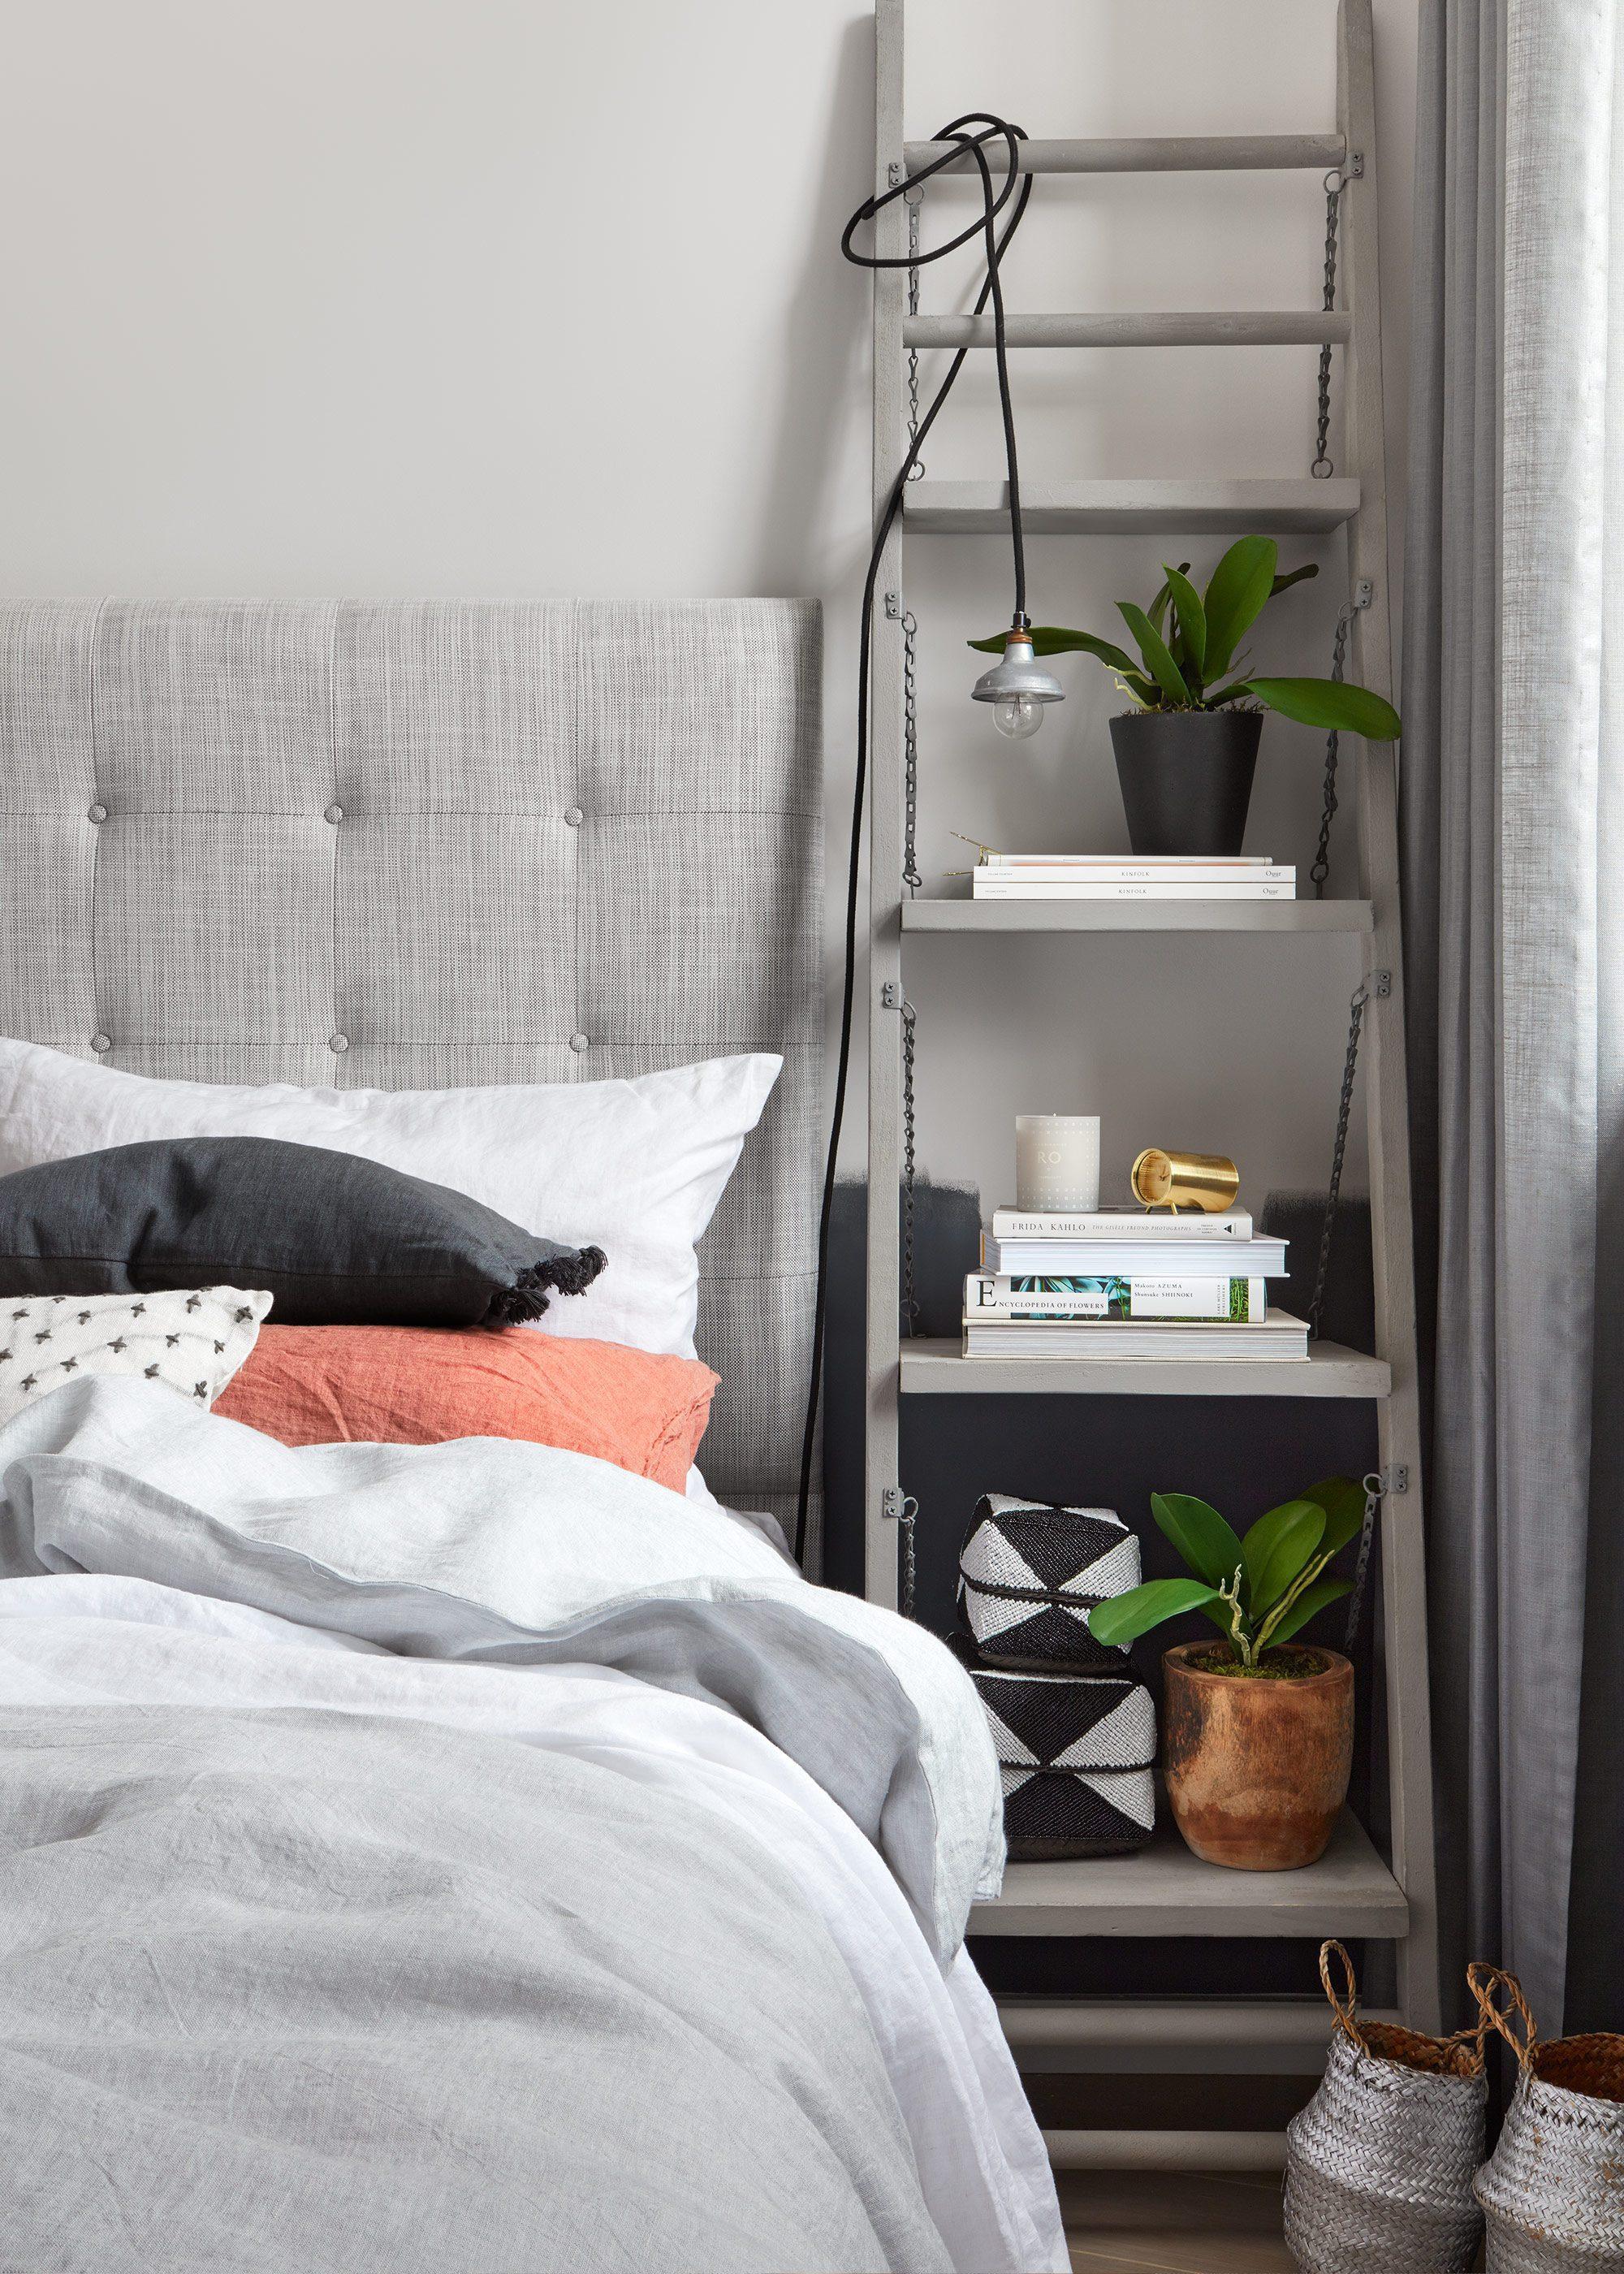 Honky Interior Design London Apartment SE1 3a Bedroom